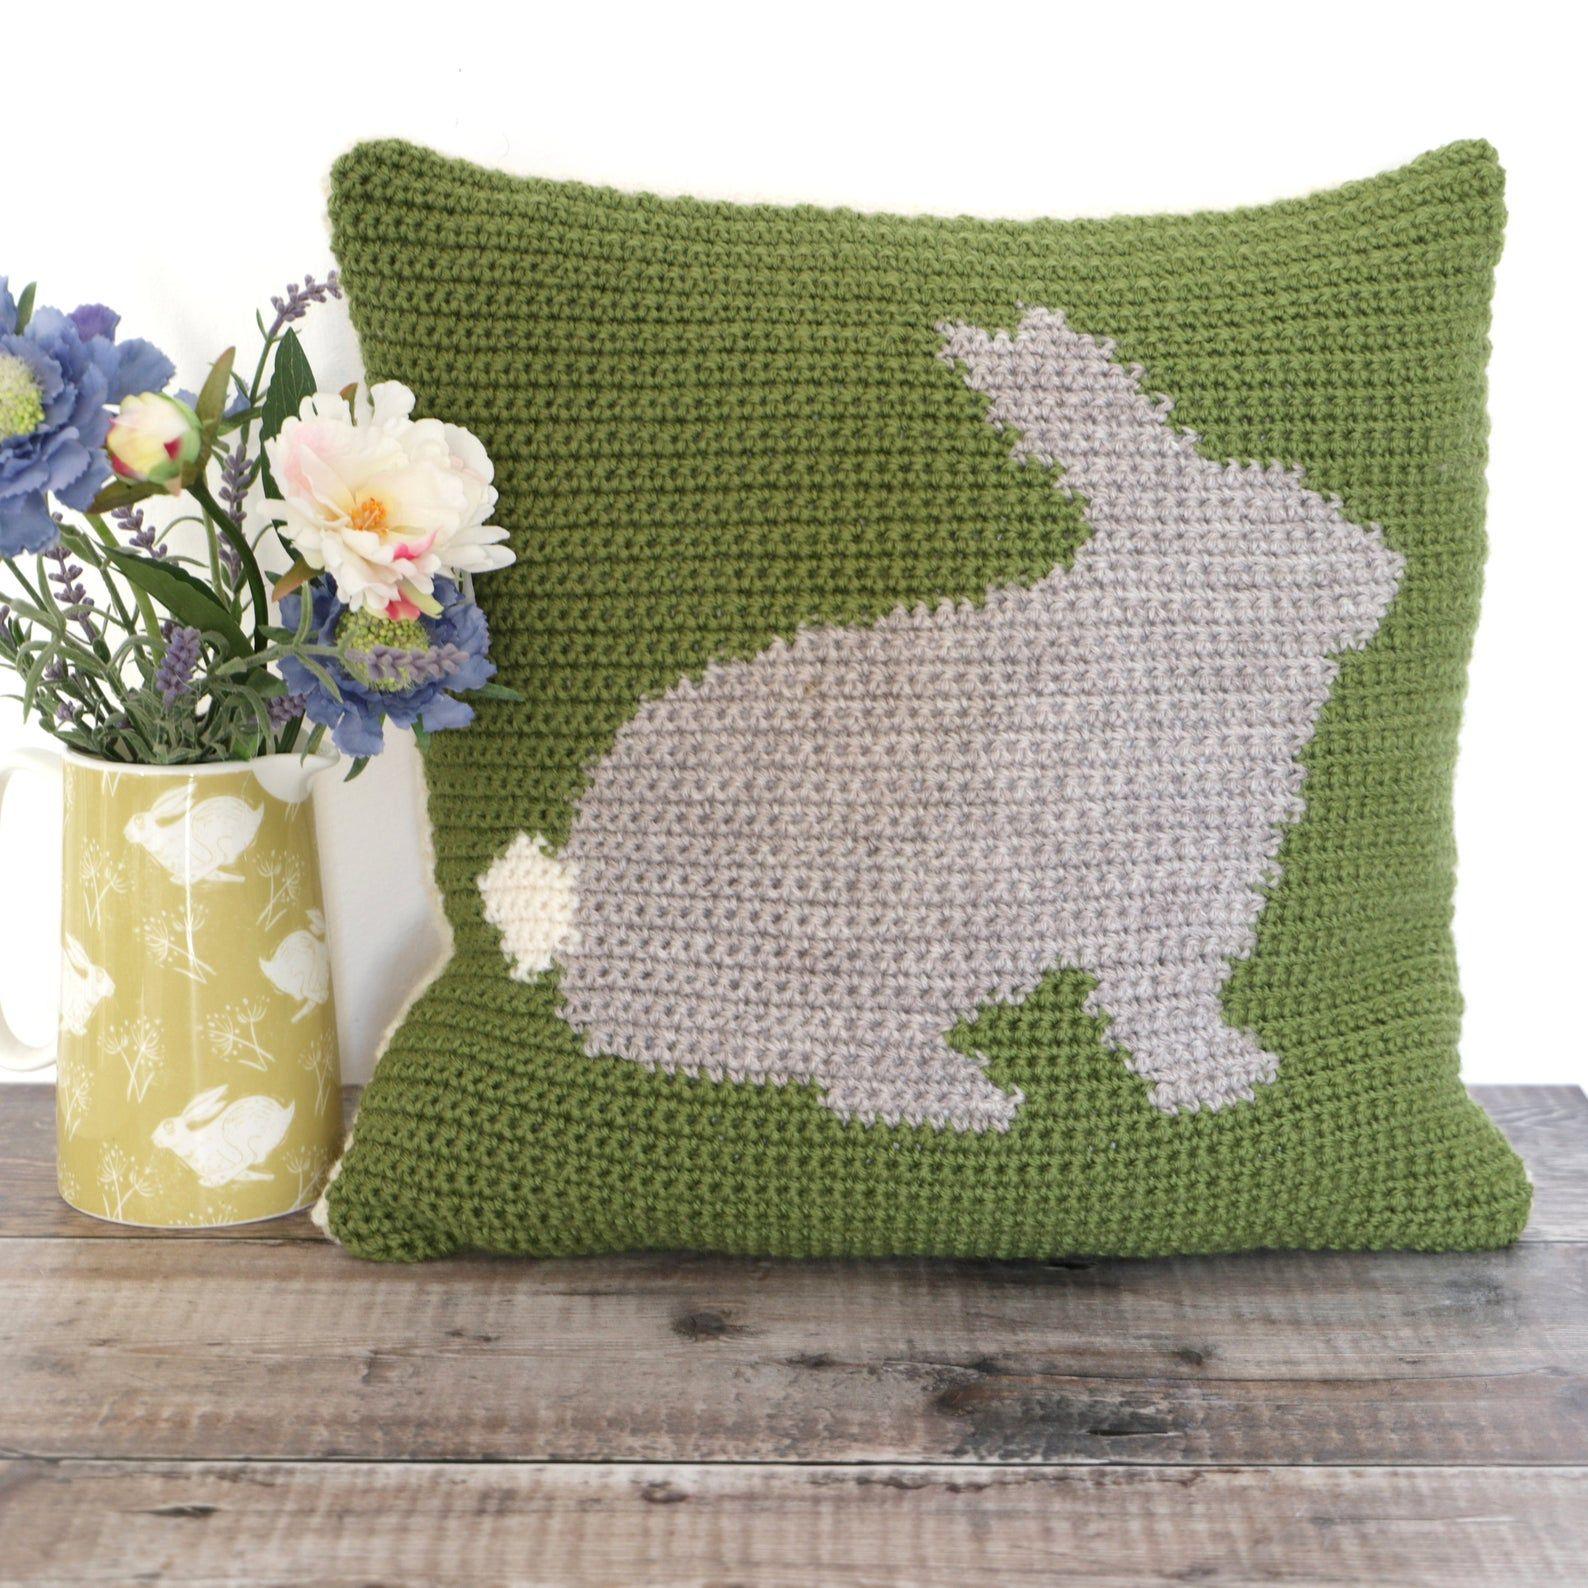 Bunny cushion crochet pattern rabbit pillow to crochet